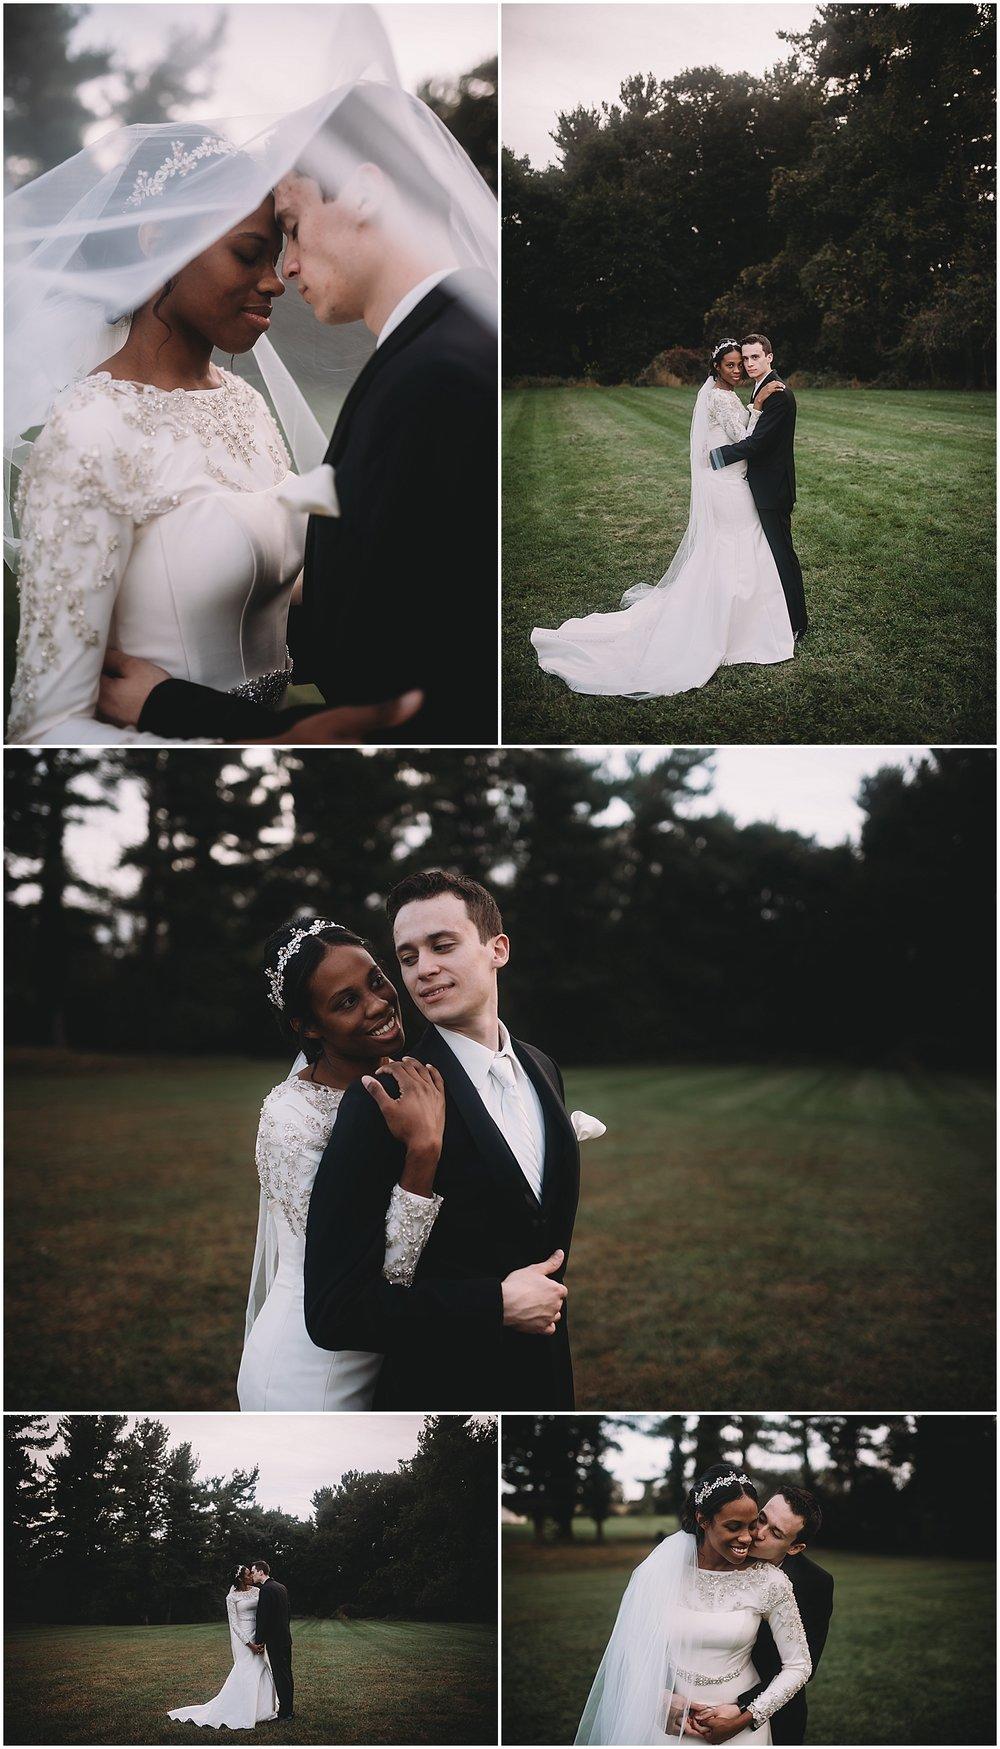 NEPA-Scranton-wedding-engagement-photographer-in-York-PA-Central-PA_0126.jpg